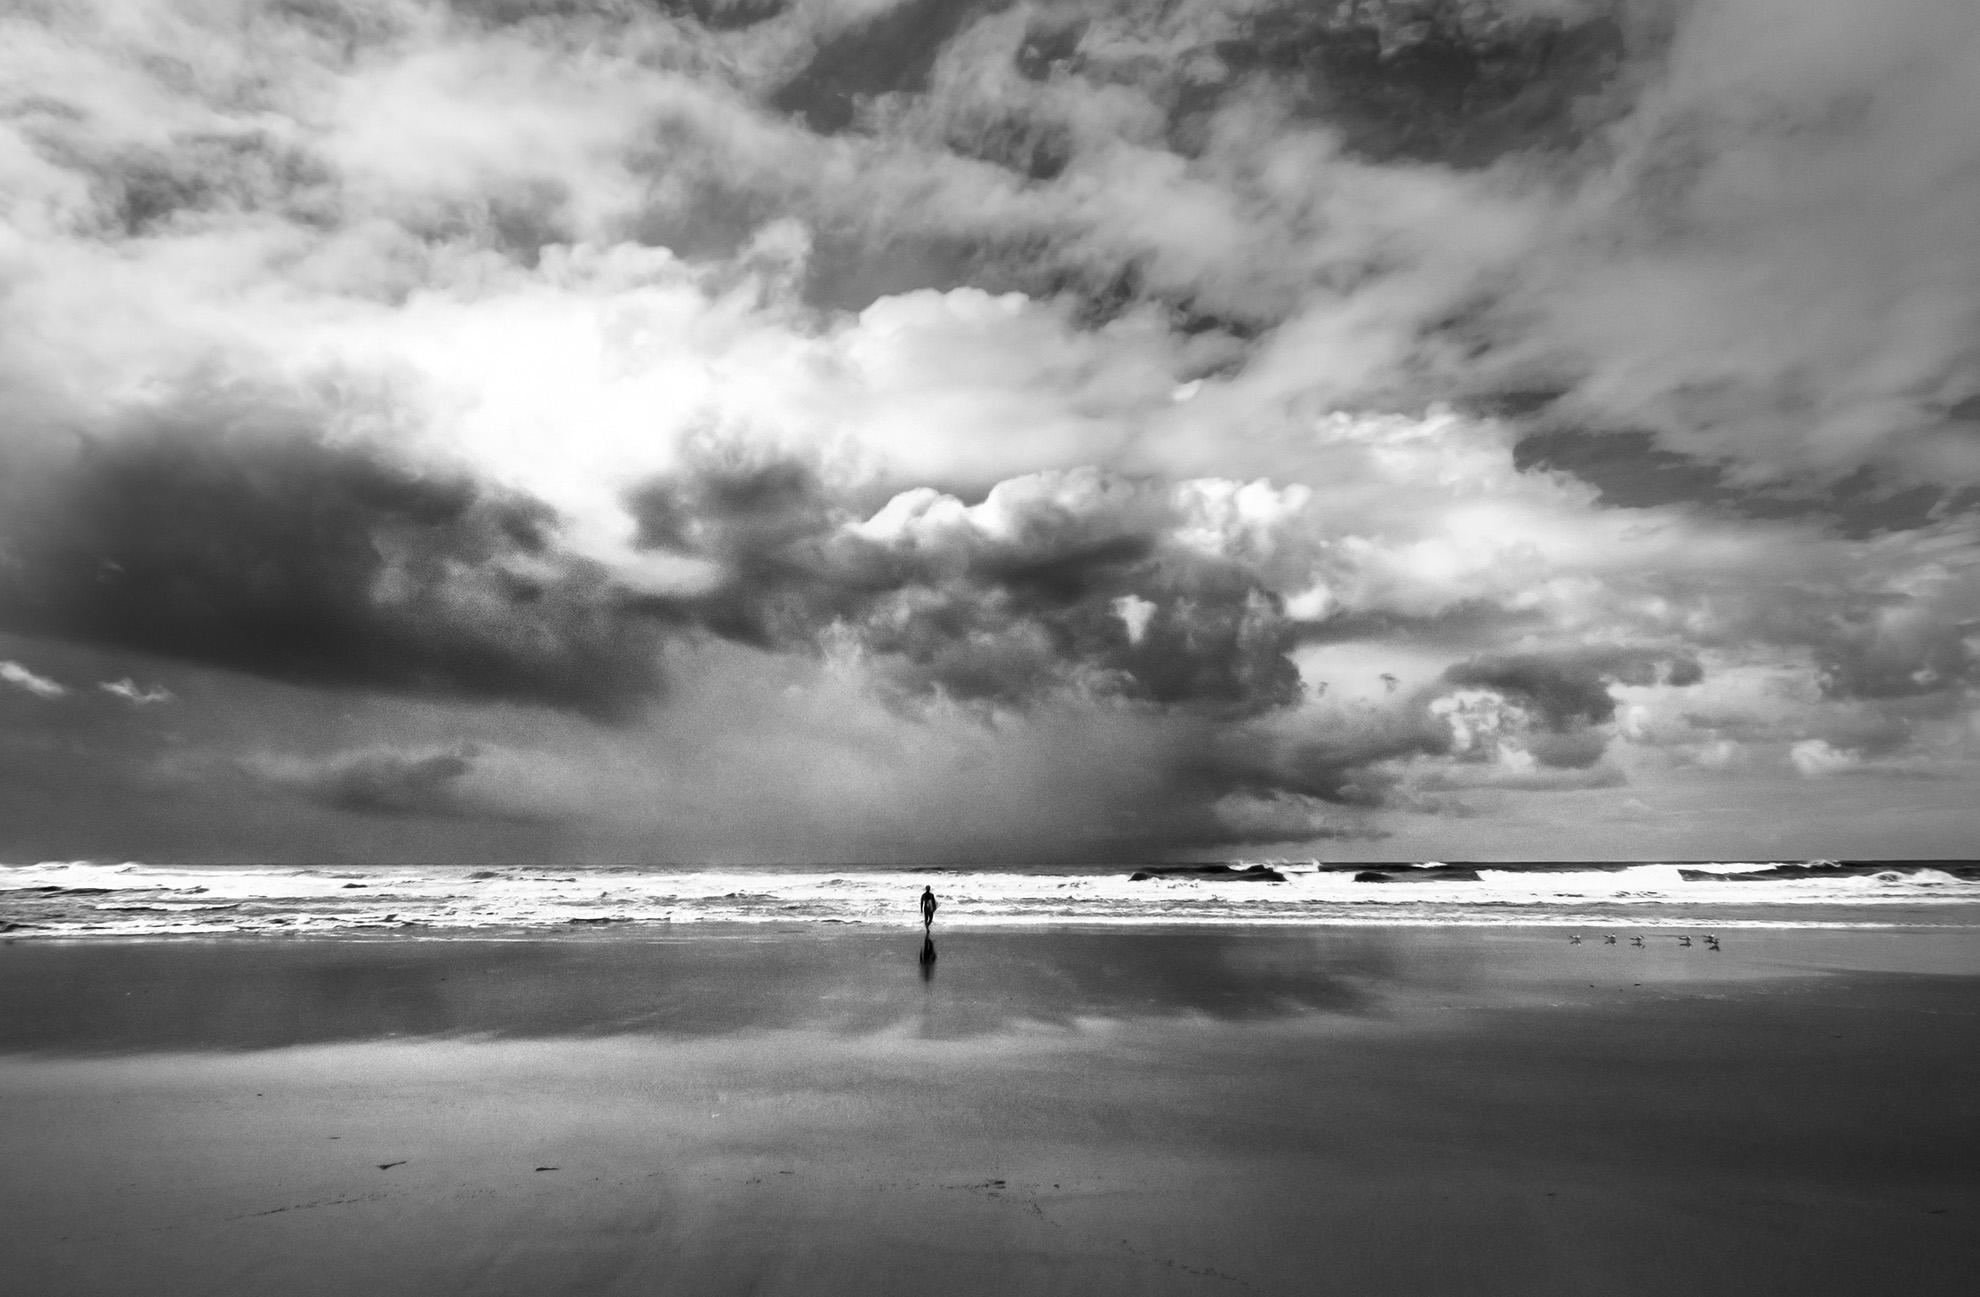 LONE SURFER - COOLUM BEACH - QUEENSLAND